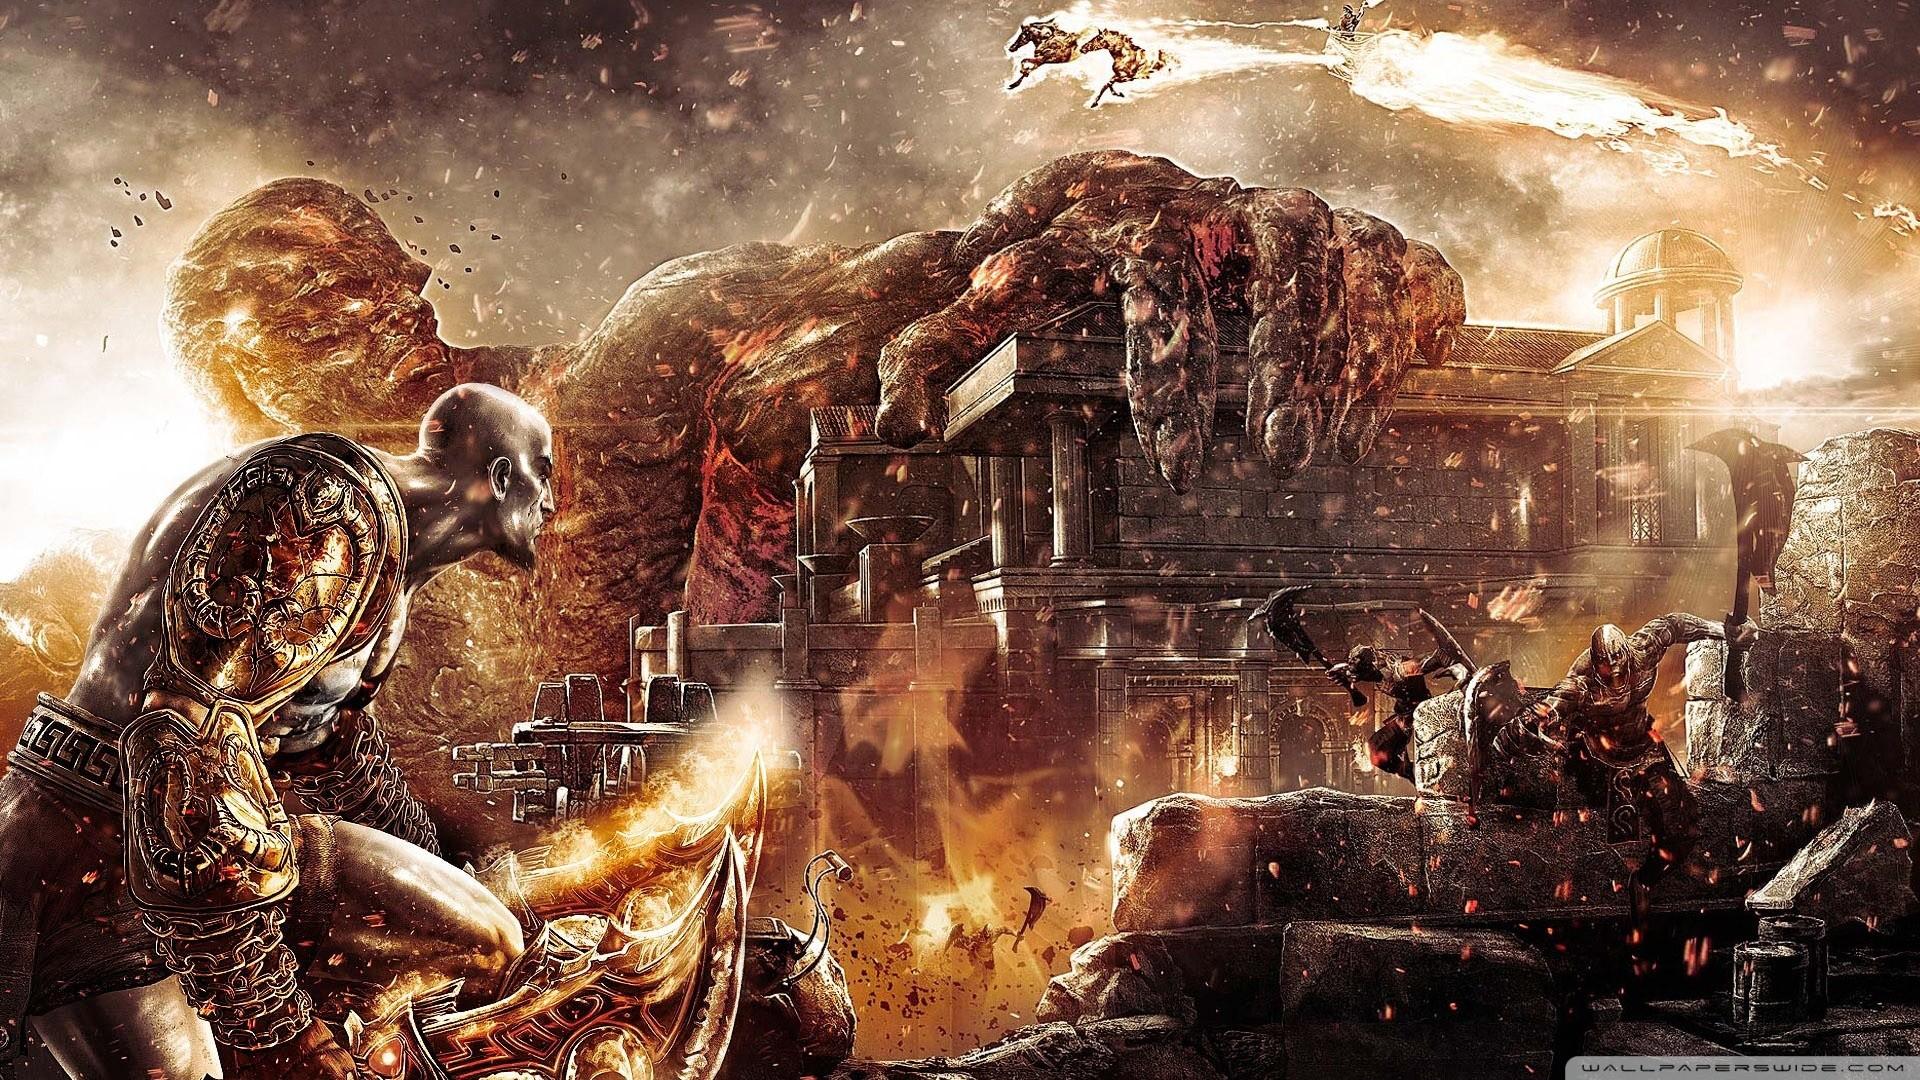 1920x1200 Latest God Of War 3